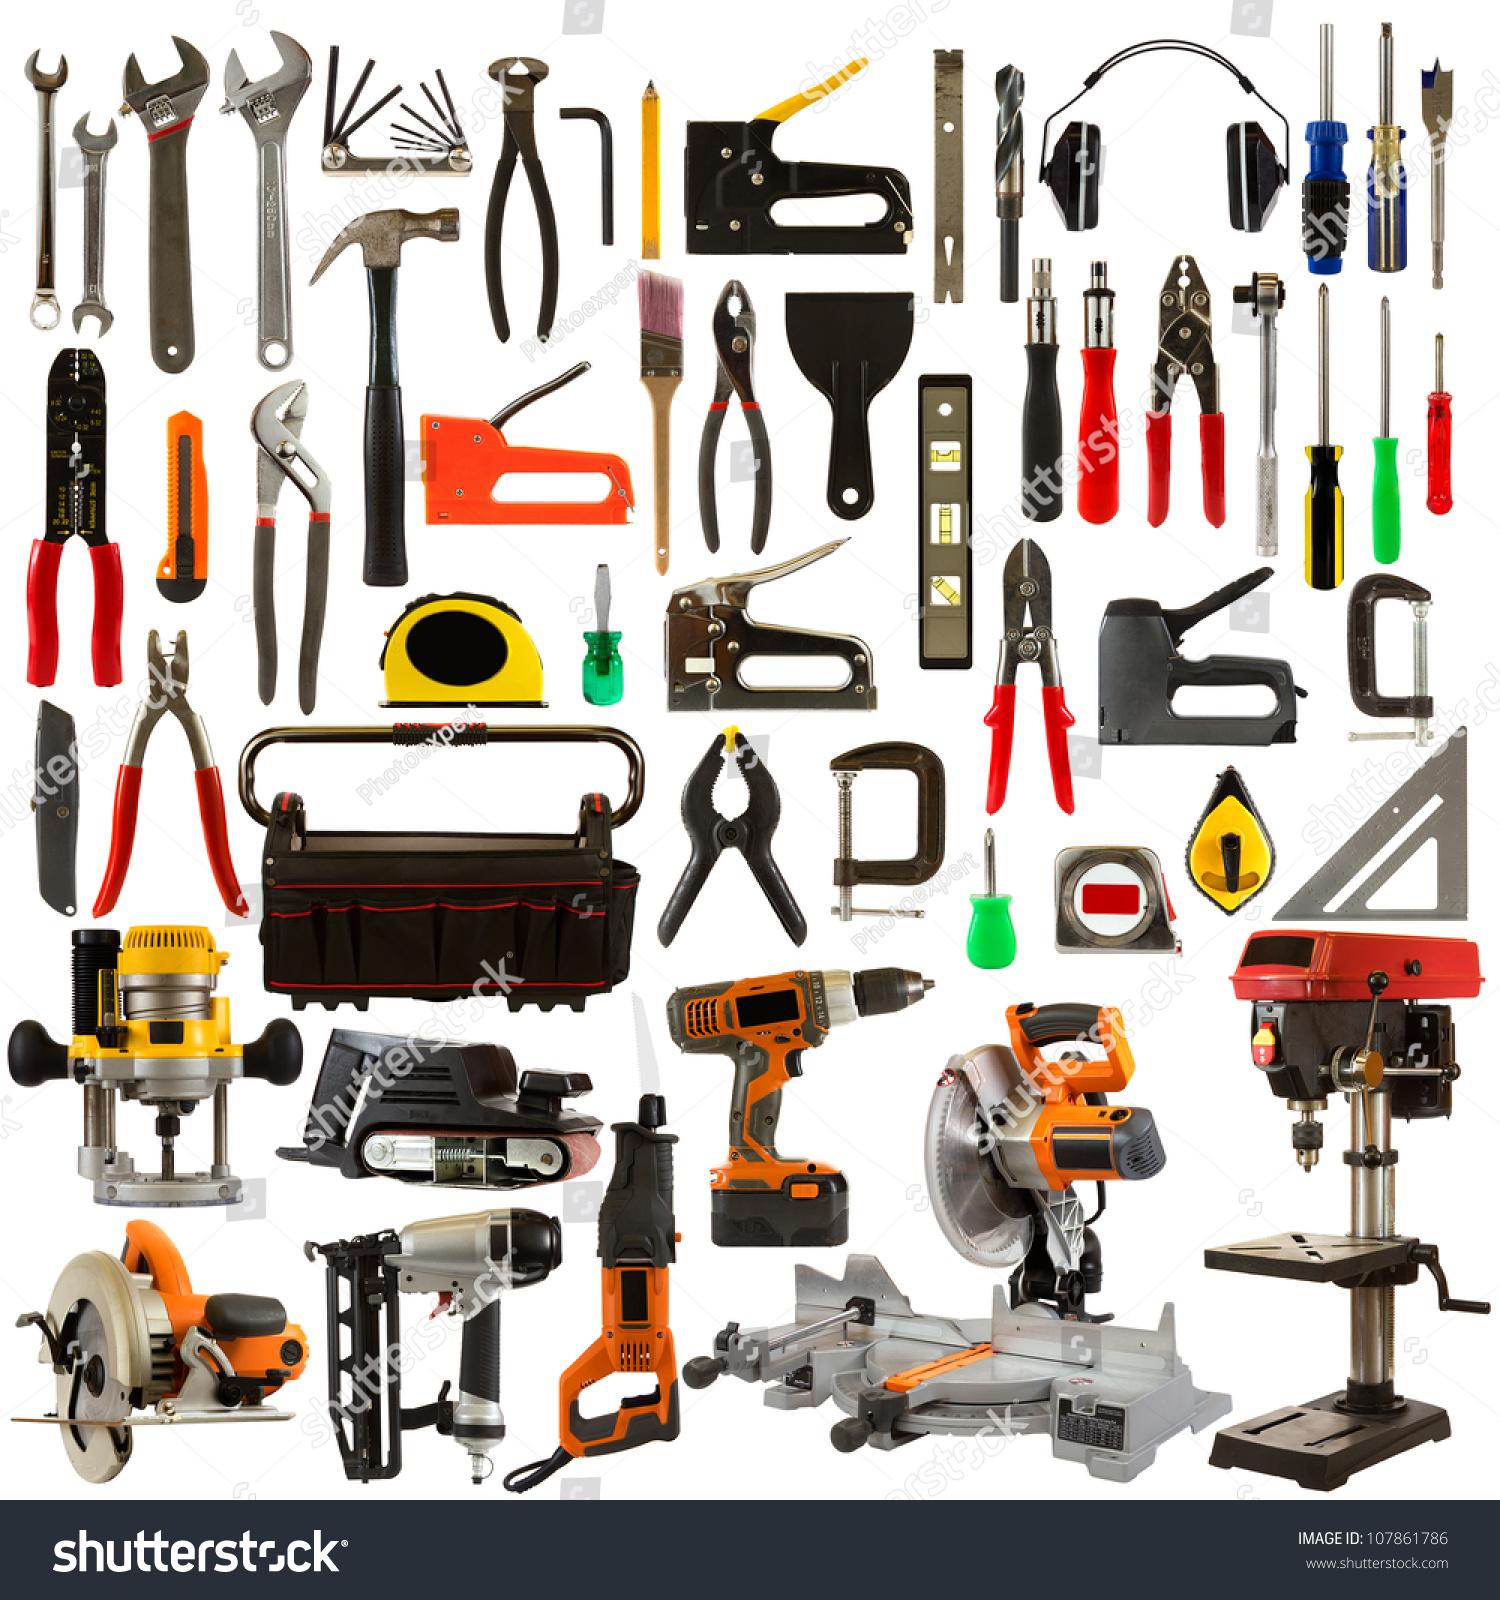 Oe Tool And Equipment Group 66